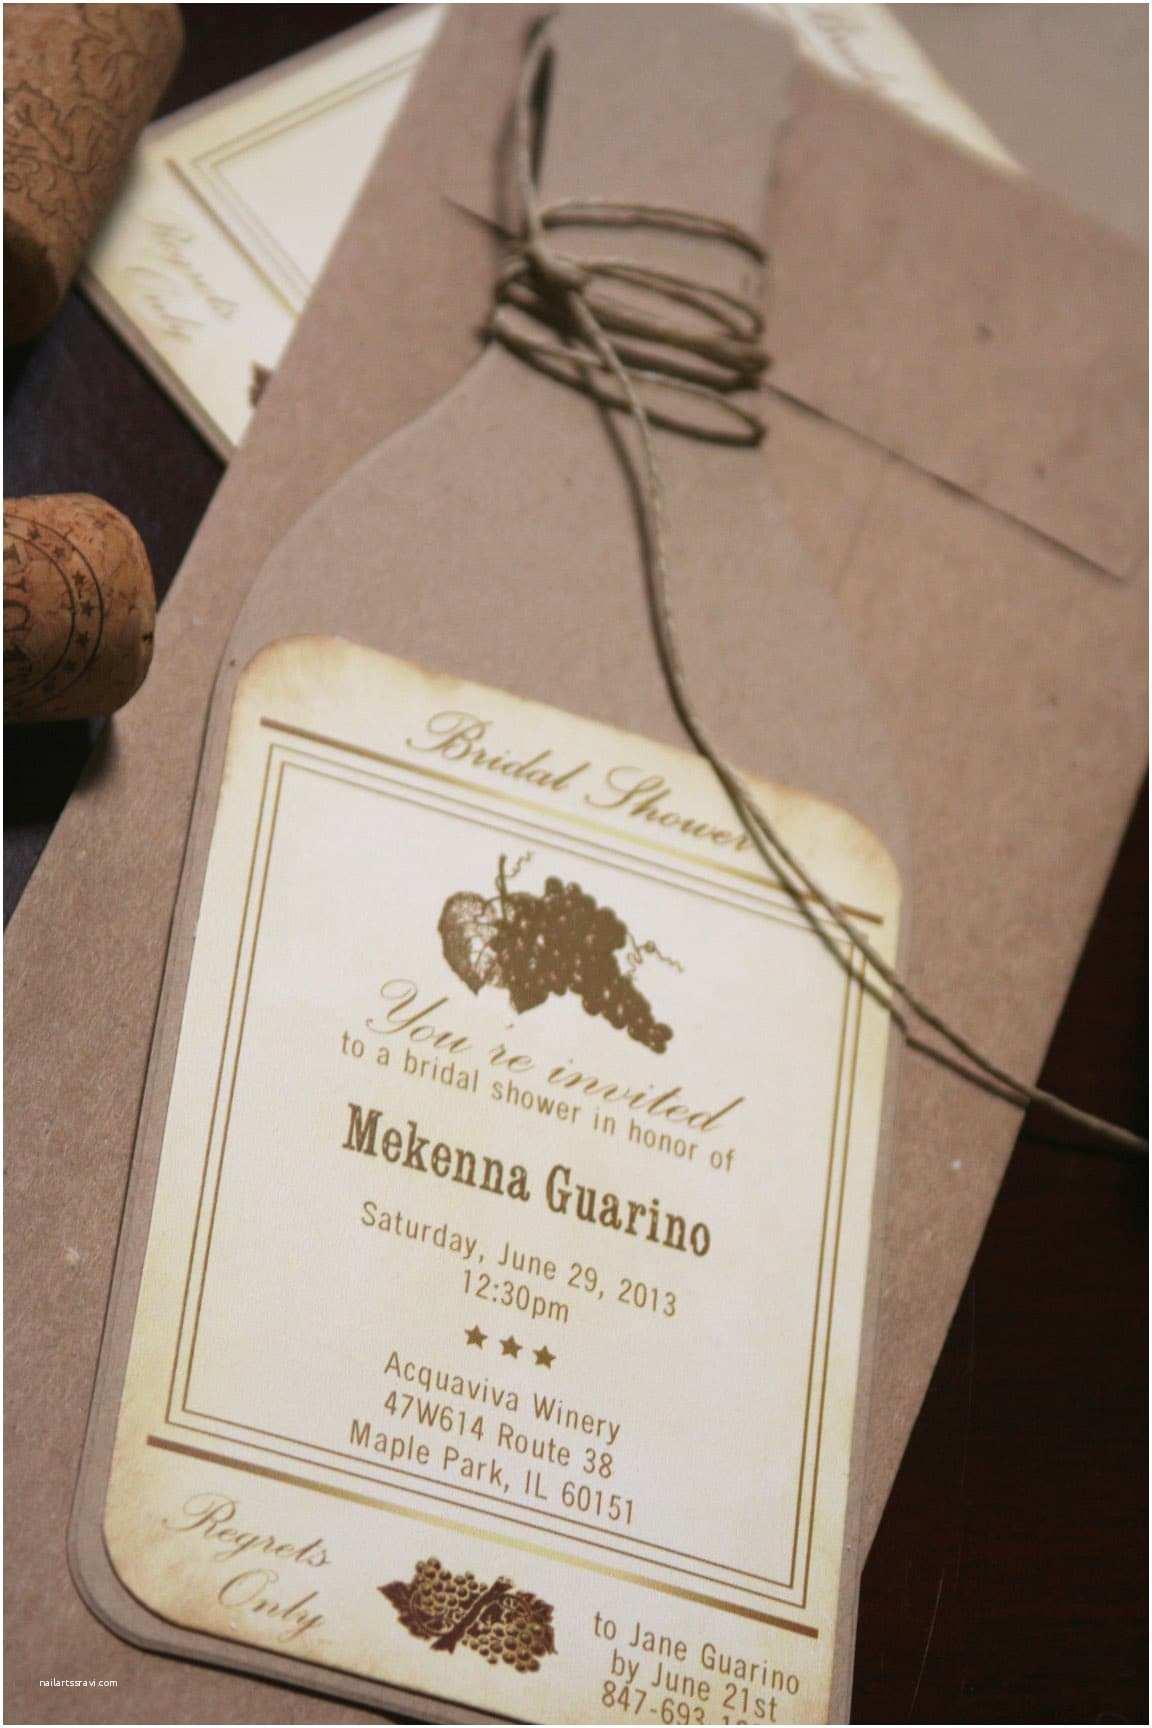 Wine Bottle Wedding Invitations Wine Bottle Bridal Shower Invitations too Chic & Little